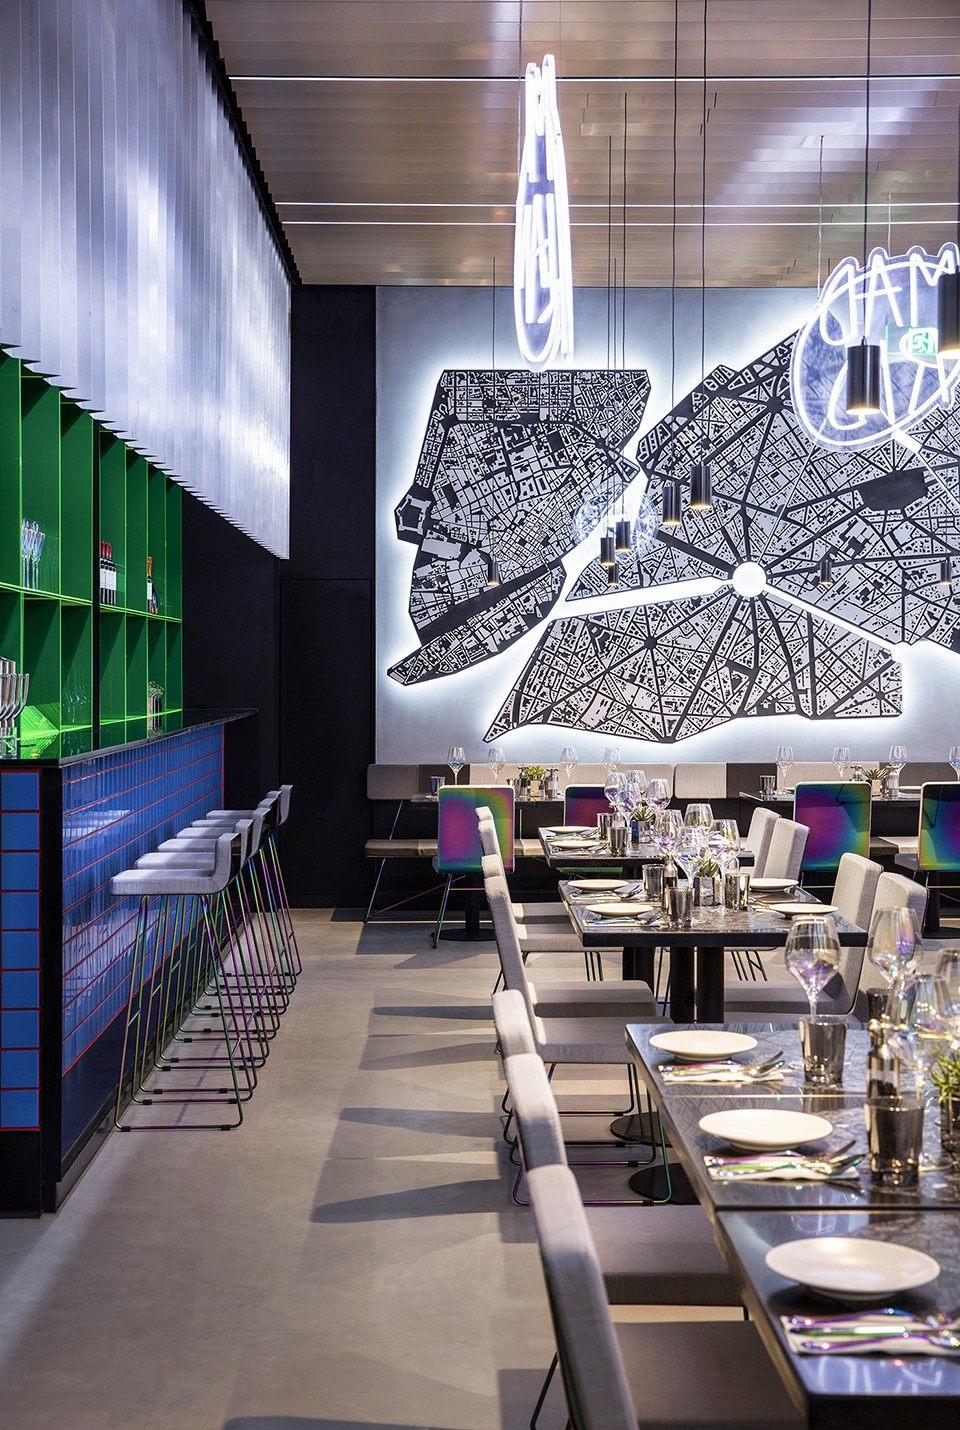 TIAGO SELECT餐厅,北京  头条计画